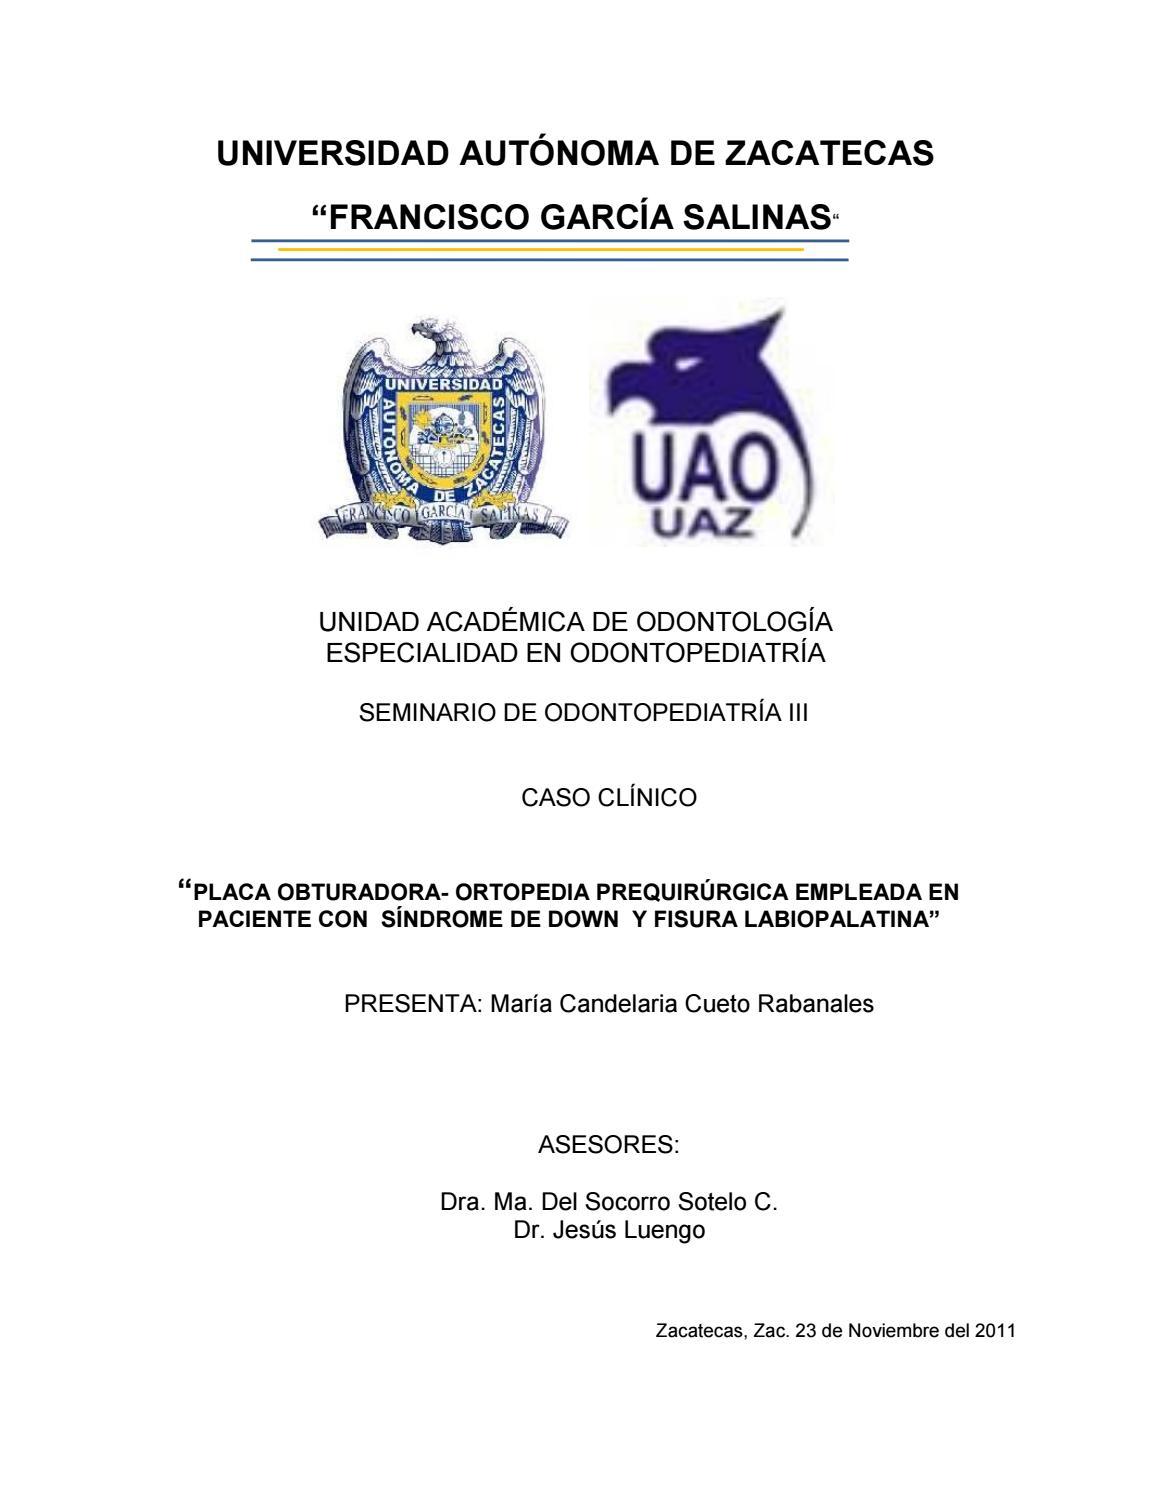 Caso clinico segundo cende cueto by Luis Antonio Santana Martinez ...